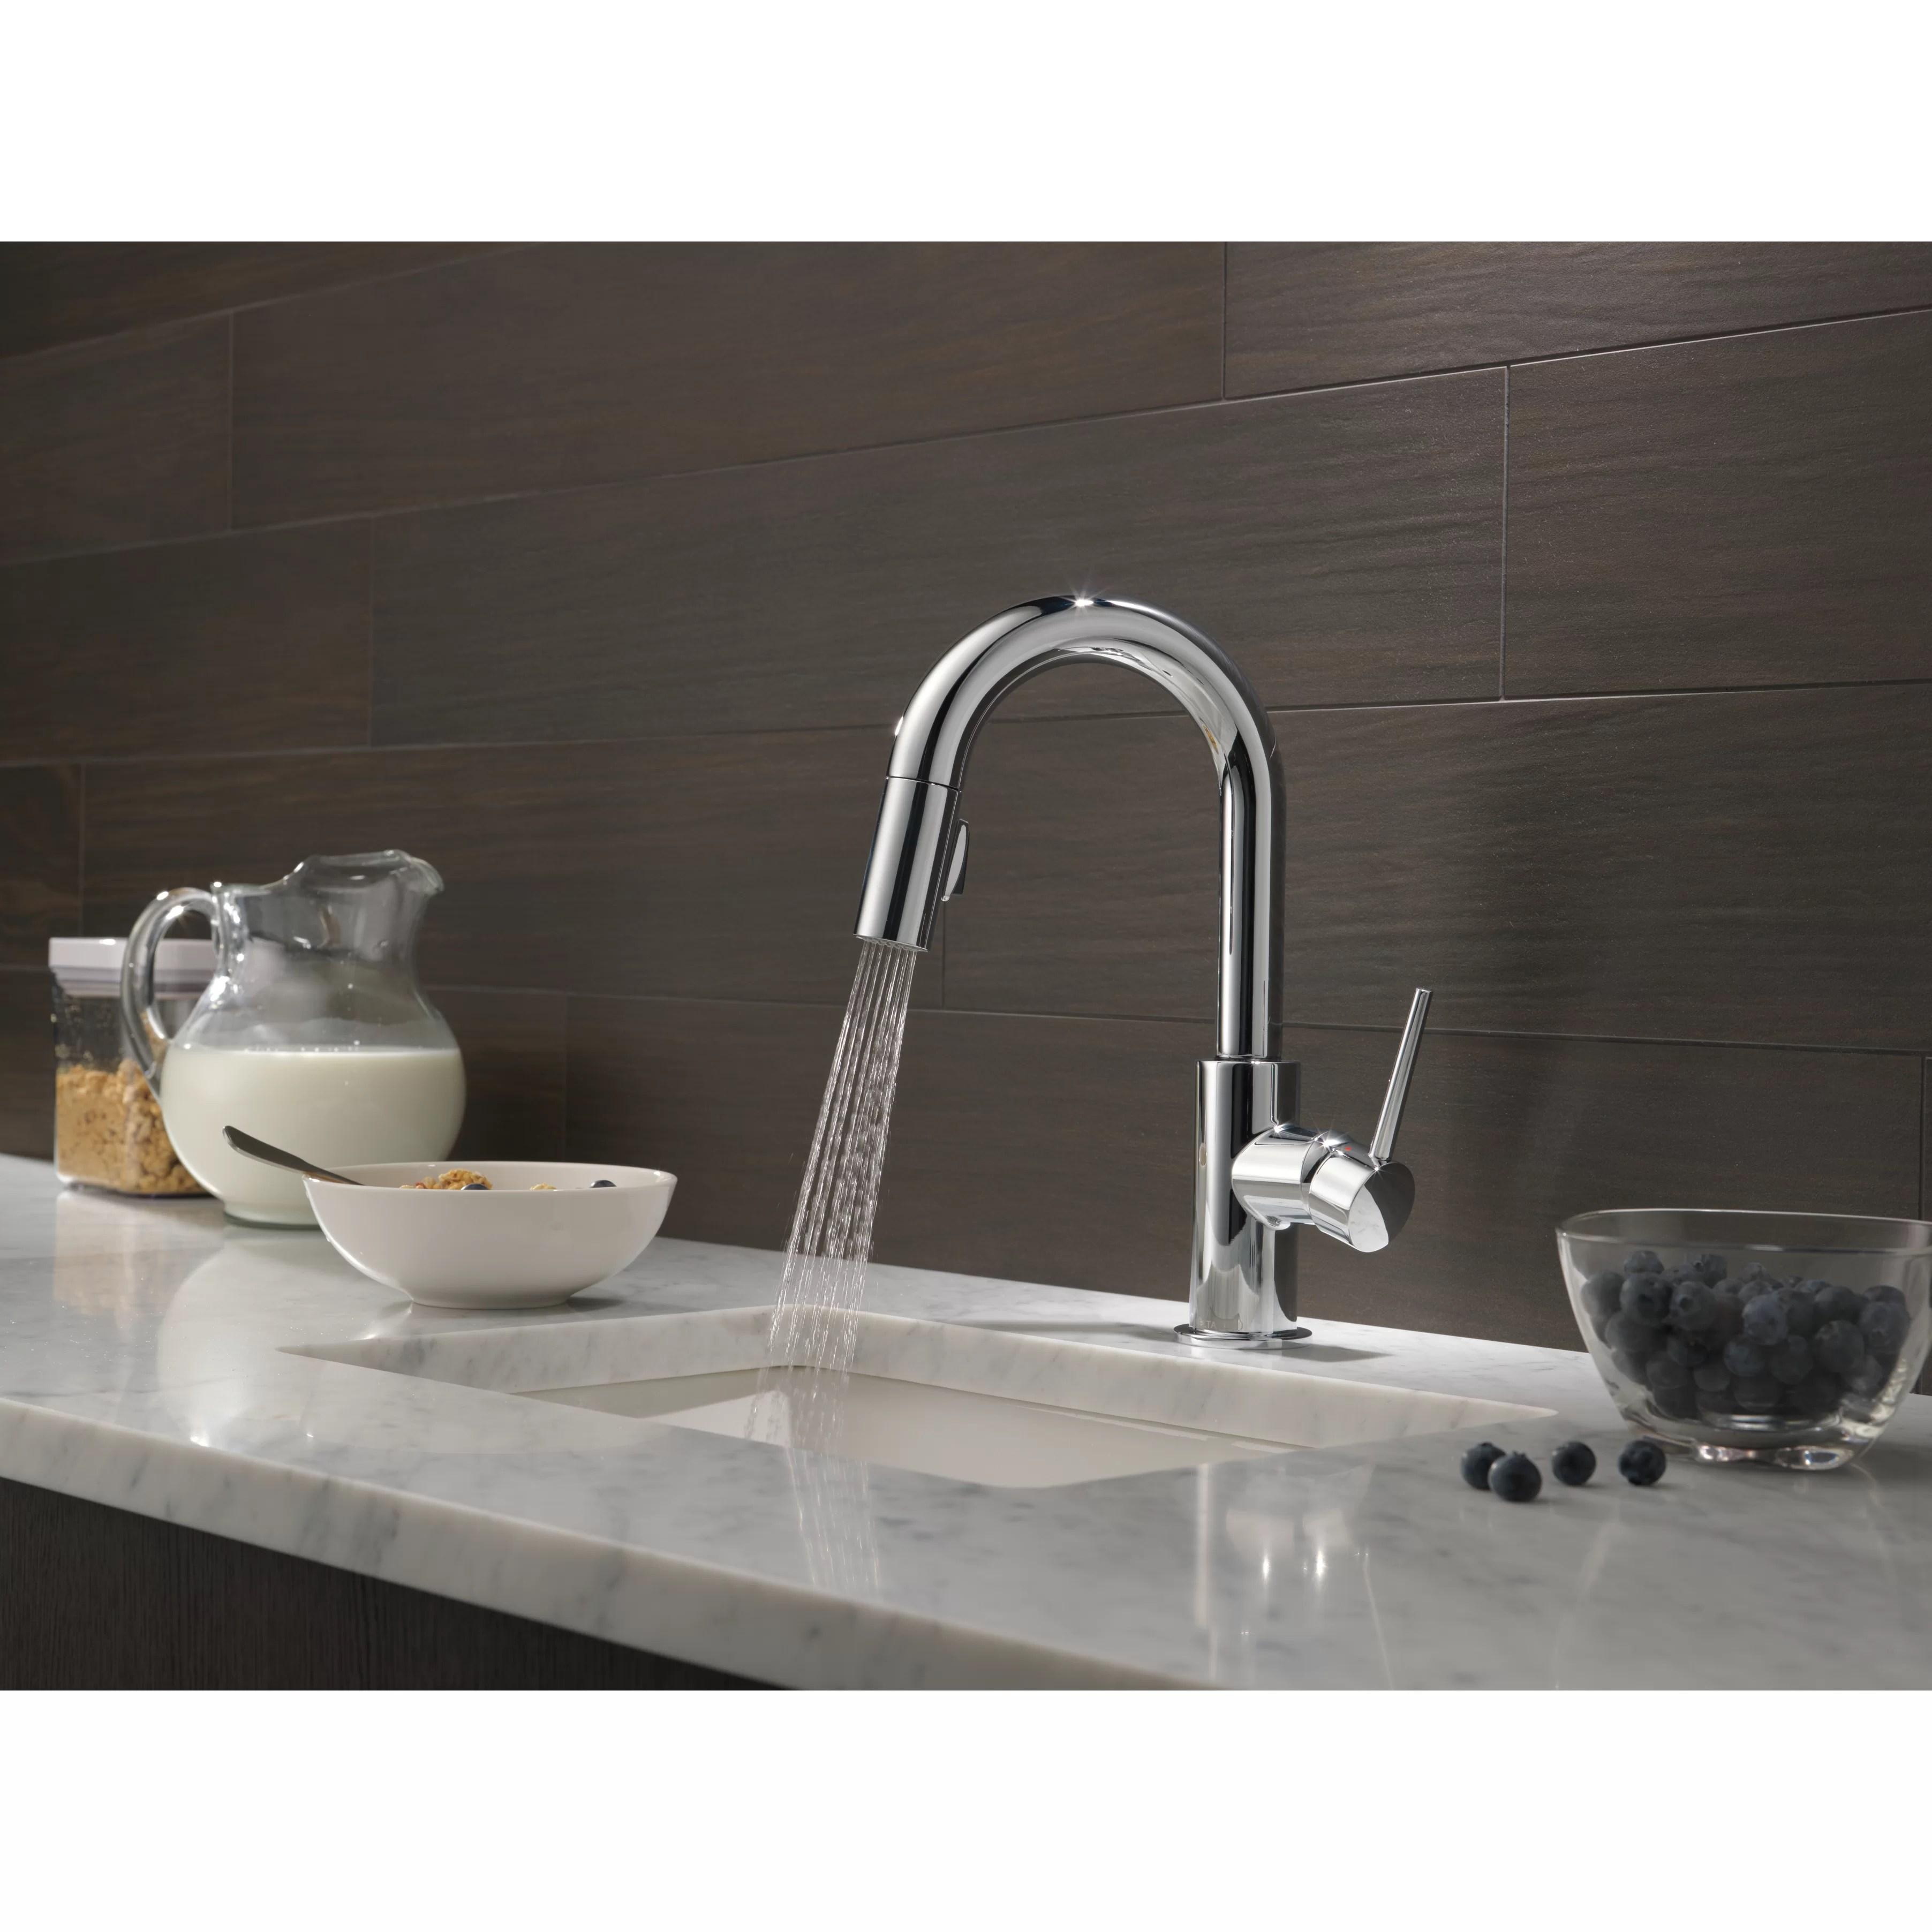 Delta Trinsic C2 AE Kitchen Single Handle Pull Down Bar Prep Faucet DLT delta trinsic kitchen faucet Delta Trinsic reg Kitchen Single Handle Pull Down Bar Prep Faucet